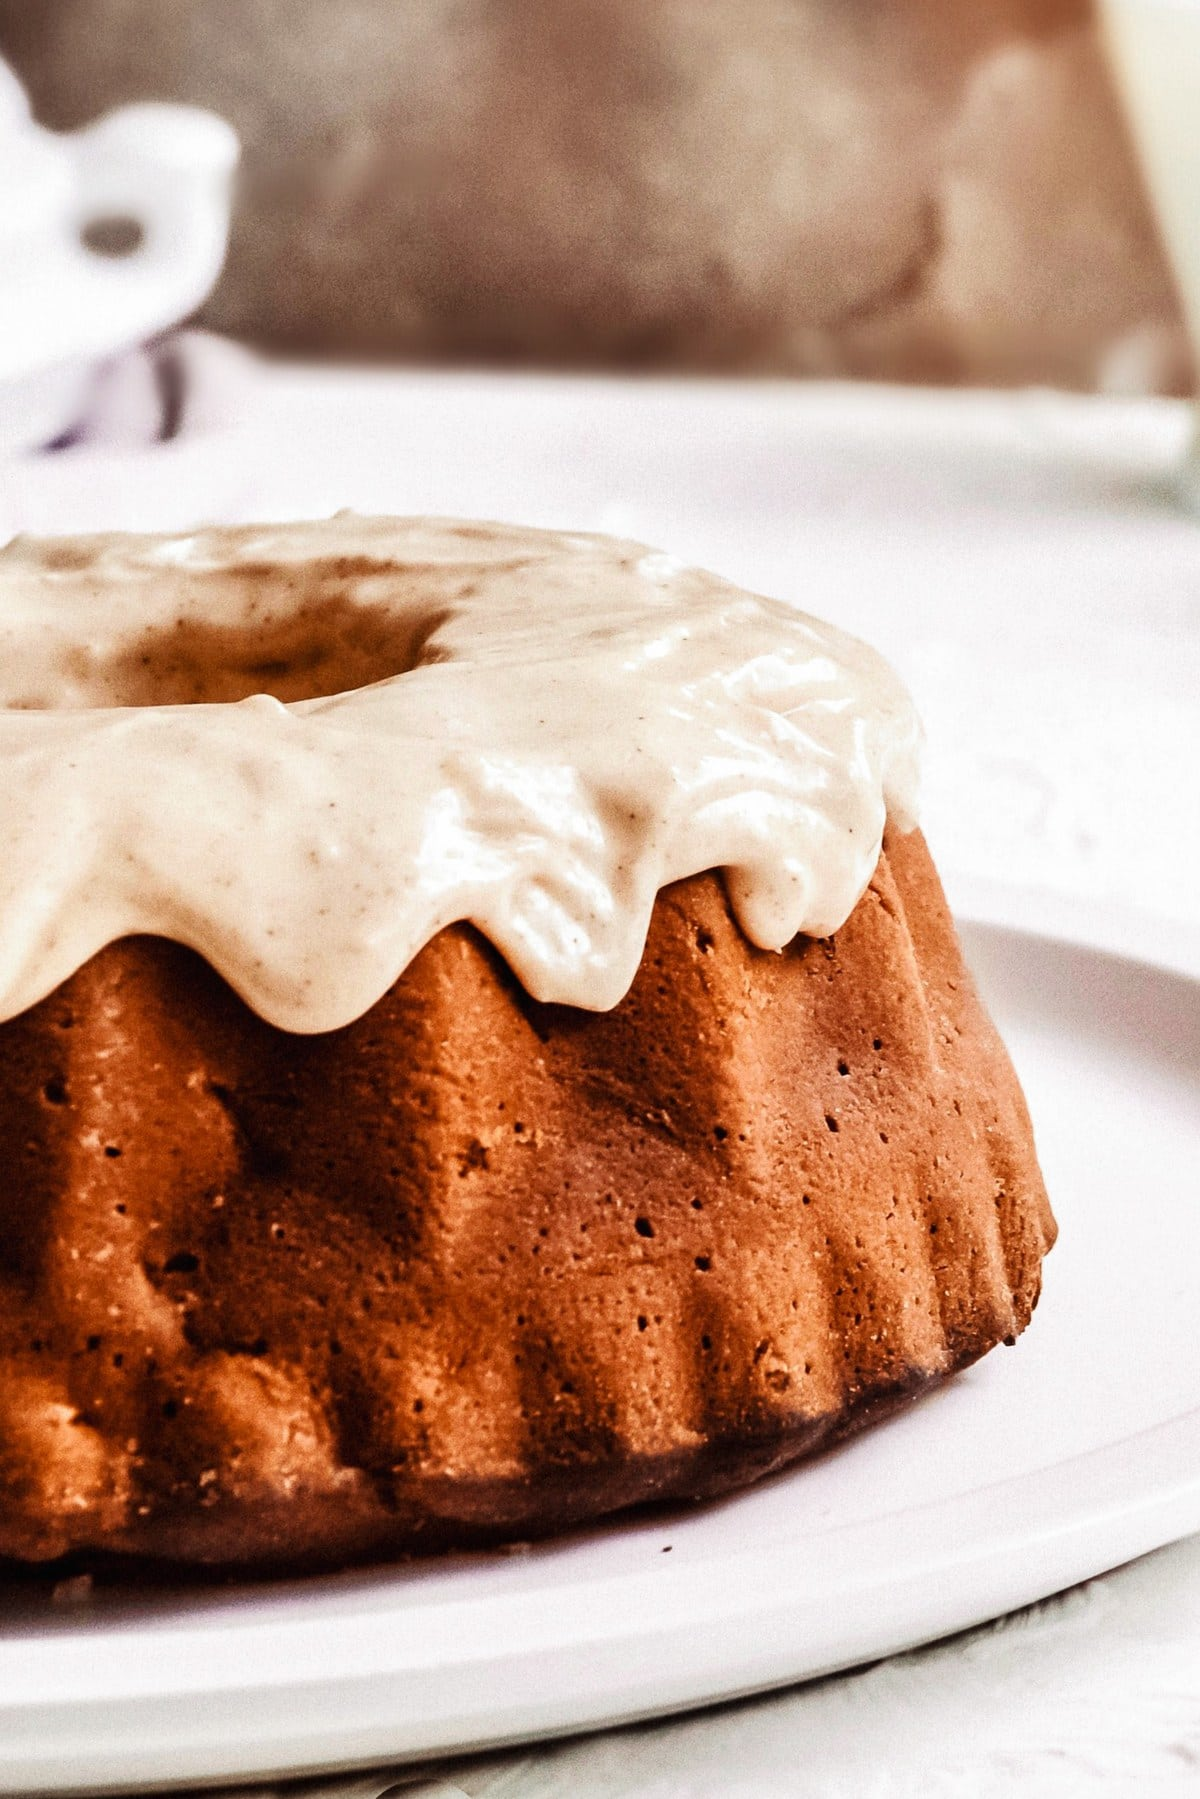 Chunky Apple Bundt Cake with cinnamon-cream cheese icing.